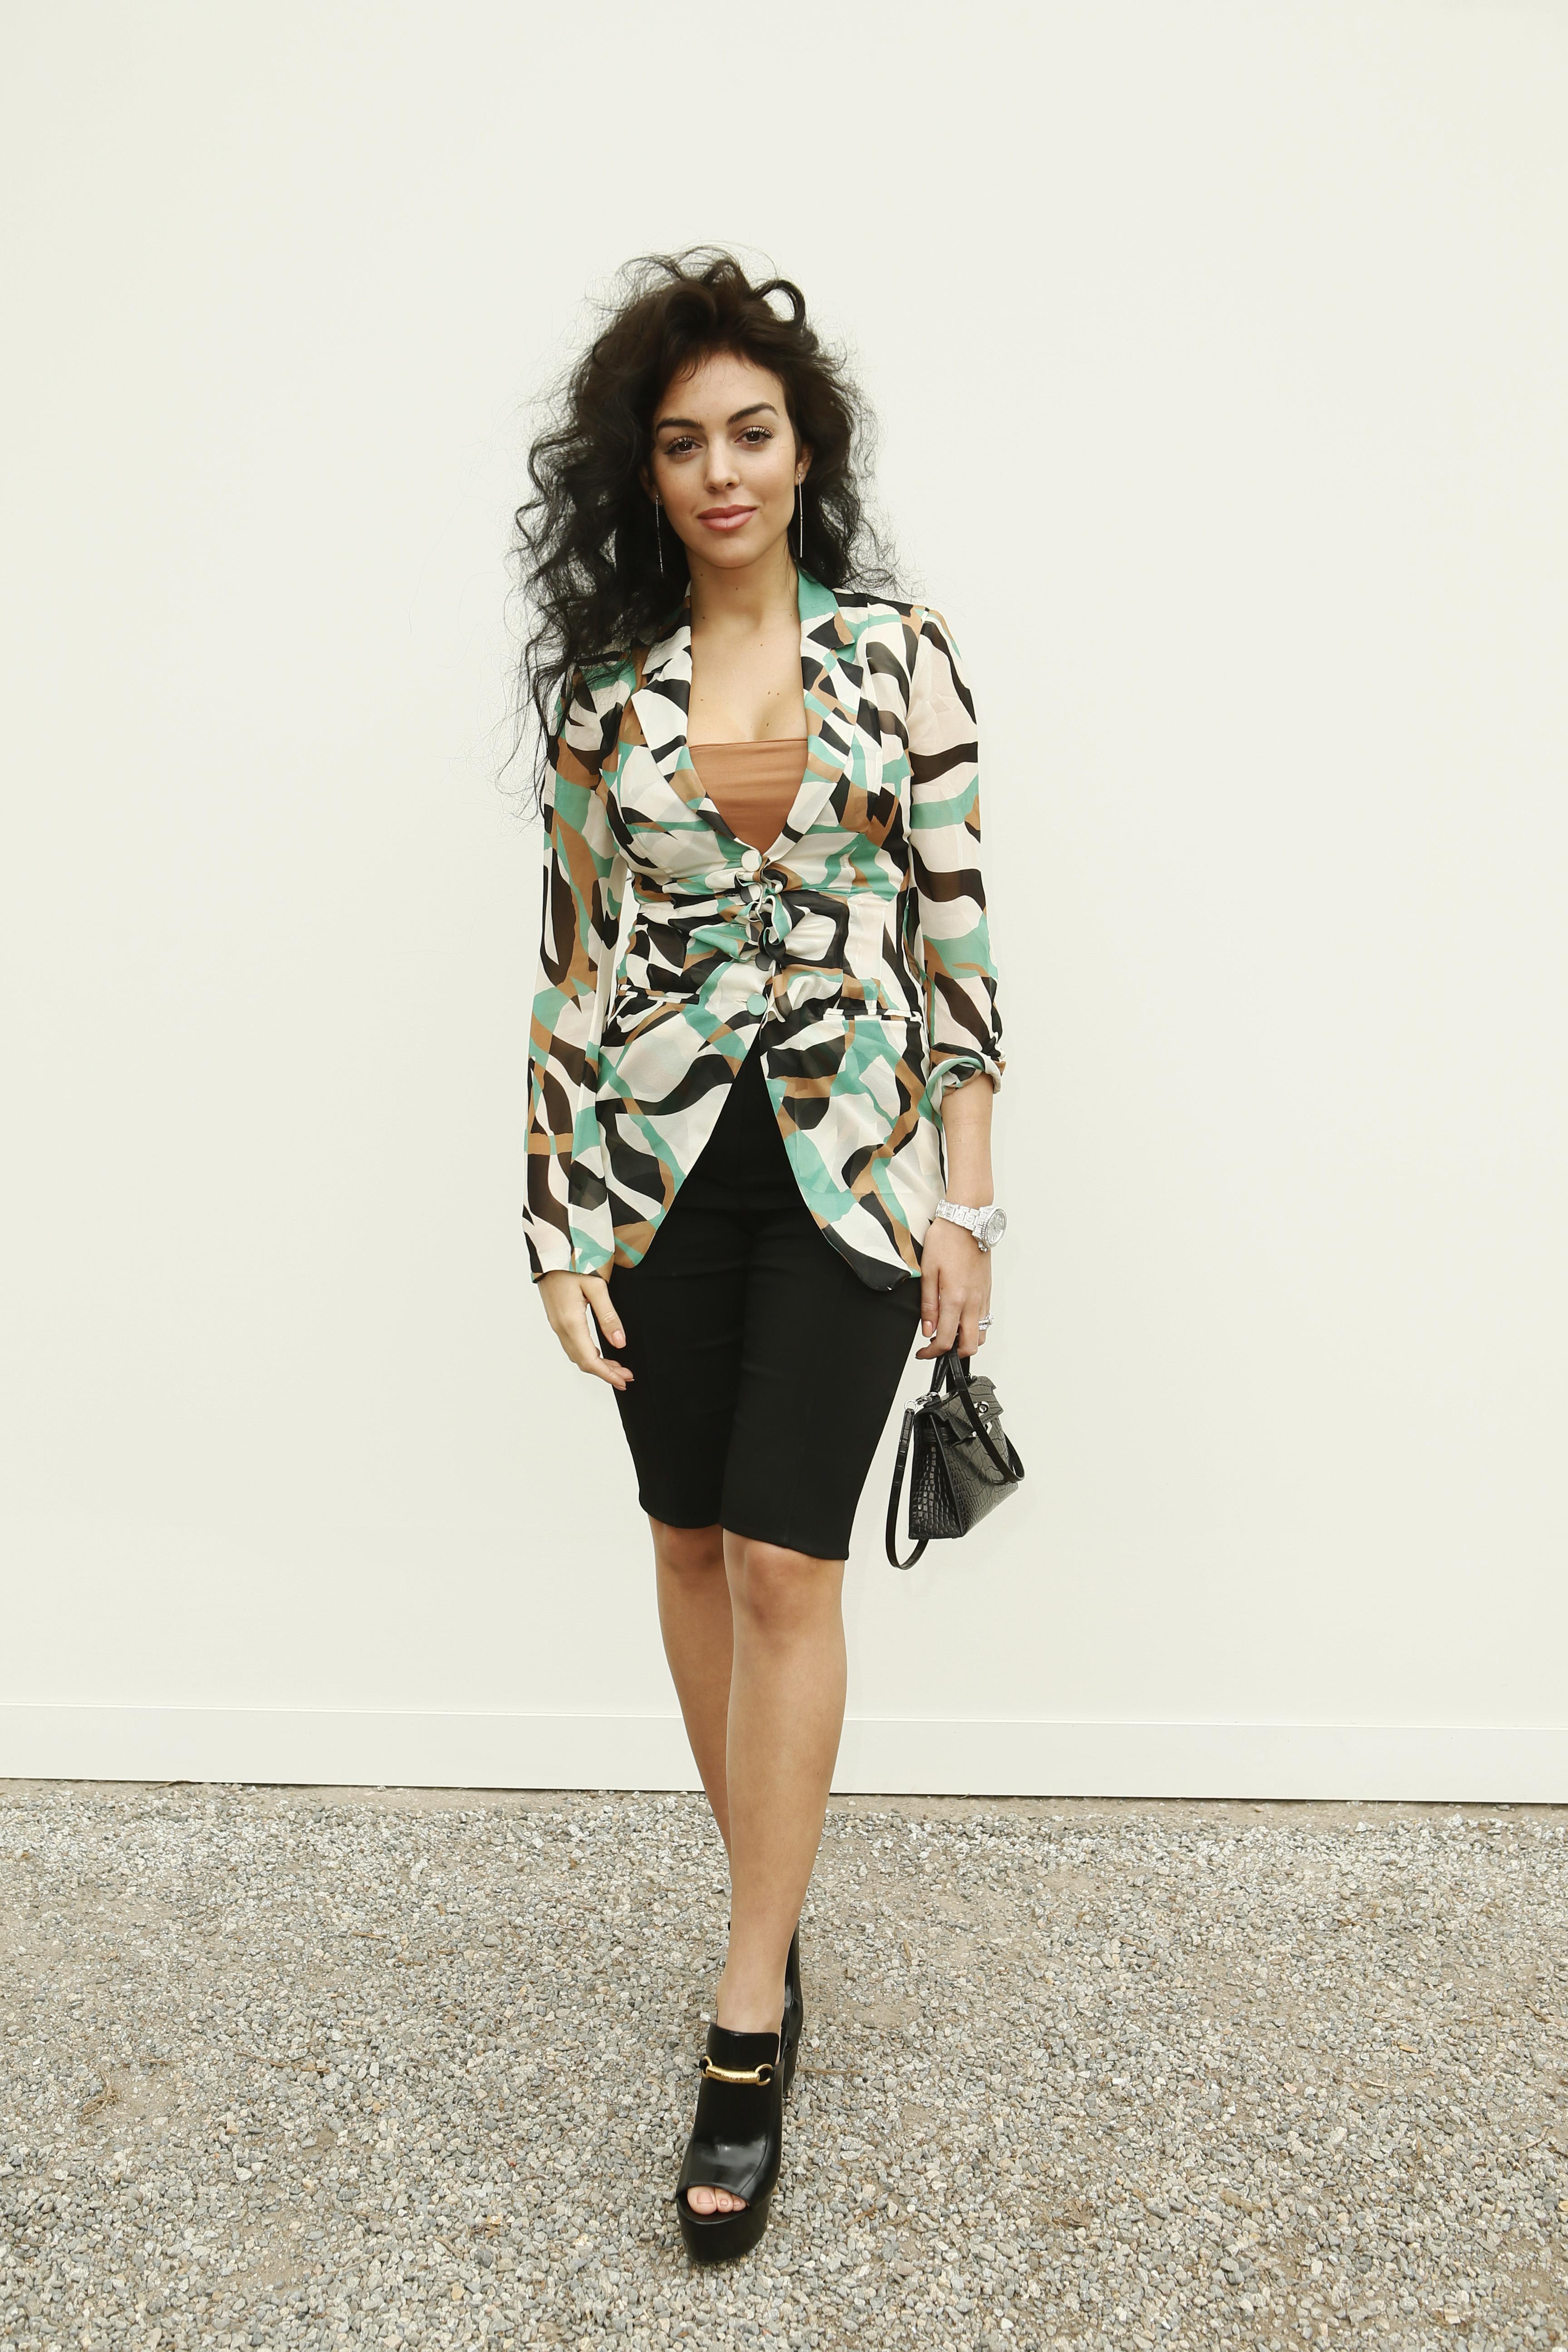 c74003ea43e Georgina Rodriguez   Roberto Cavalli Fashion Show Fall Winter 2019-20  Women s   Men s collection